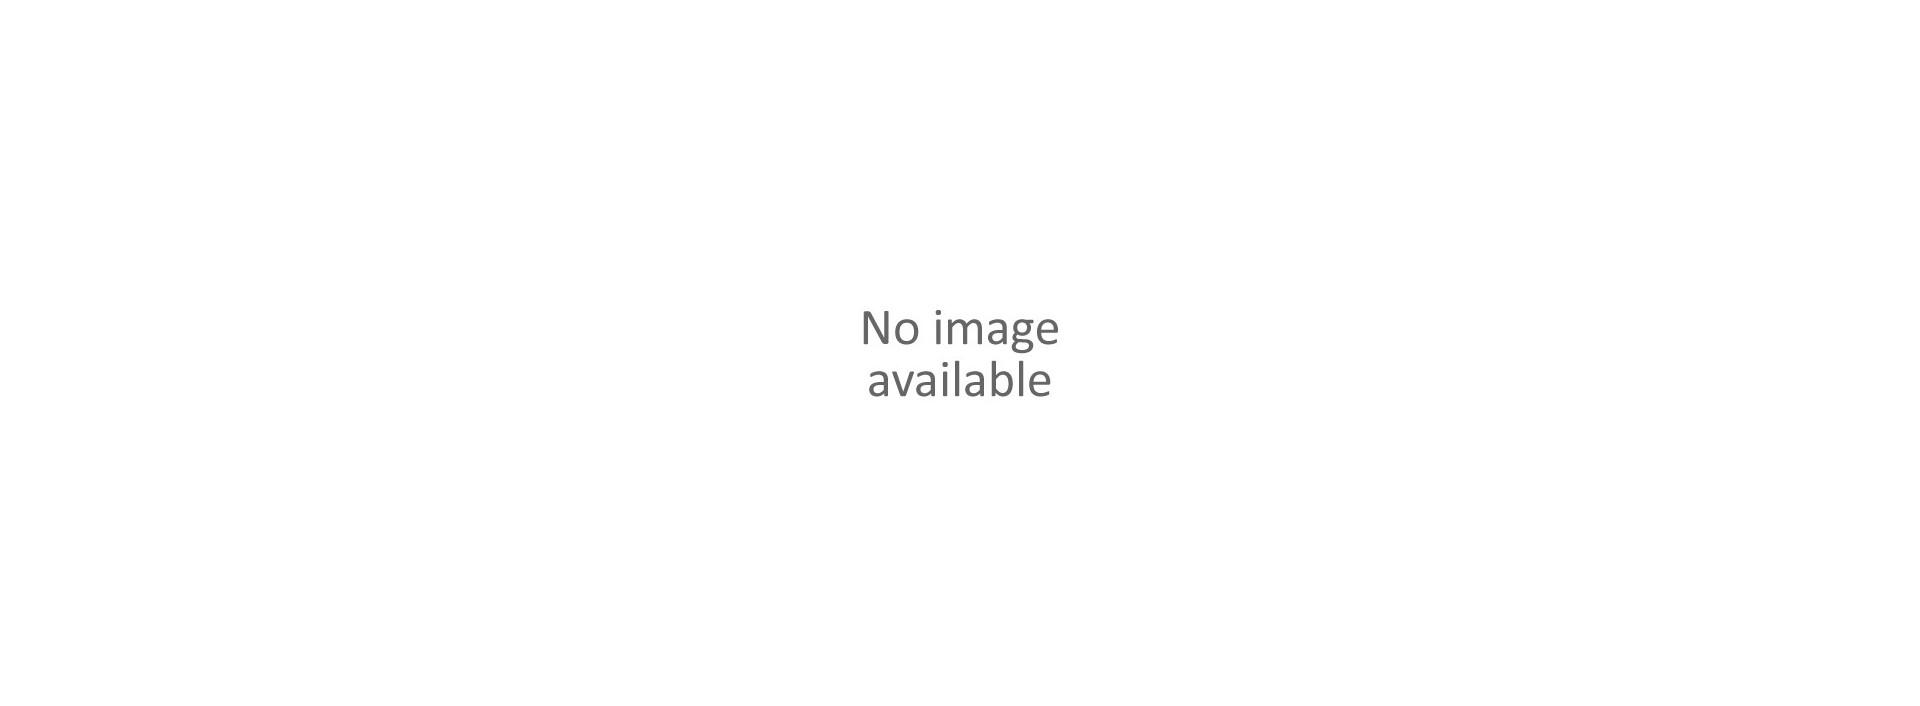 ADRENALYN XL 2015 - 2016 CAJA SELLADA 50 SOBRES